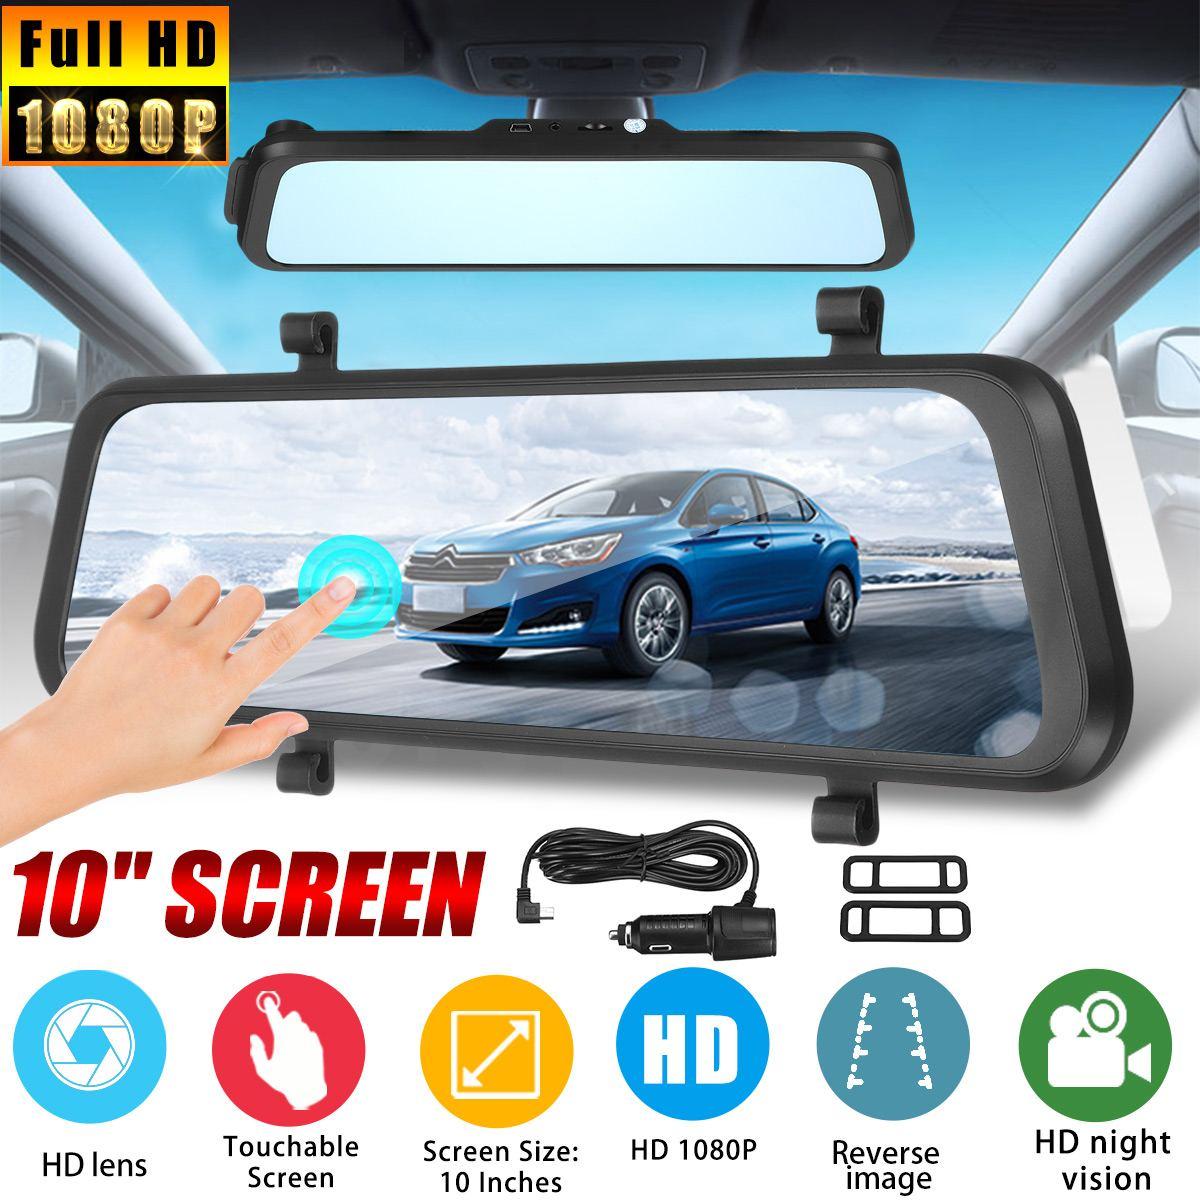 10 Inch 1080P Rear View Mirror Streaming Media Touching Night Vision Dash Cam Car DVR10 Inch 1080P Rear View Mirror Streaming Media Touching Night Vision Dash Cam Car DVR